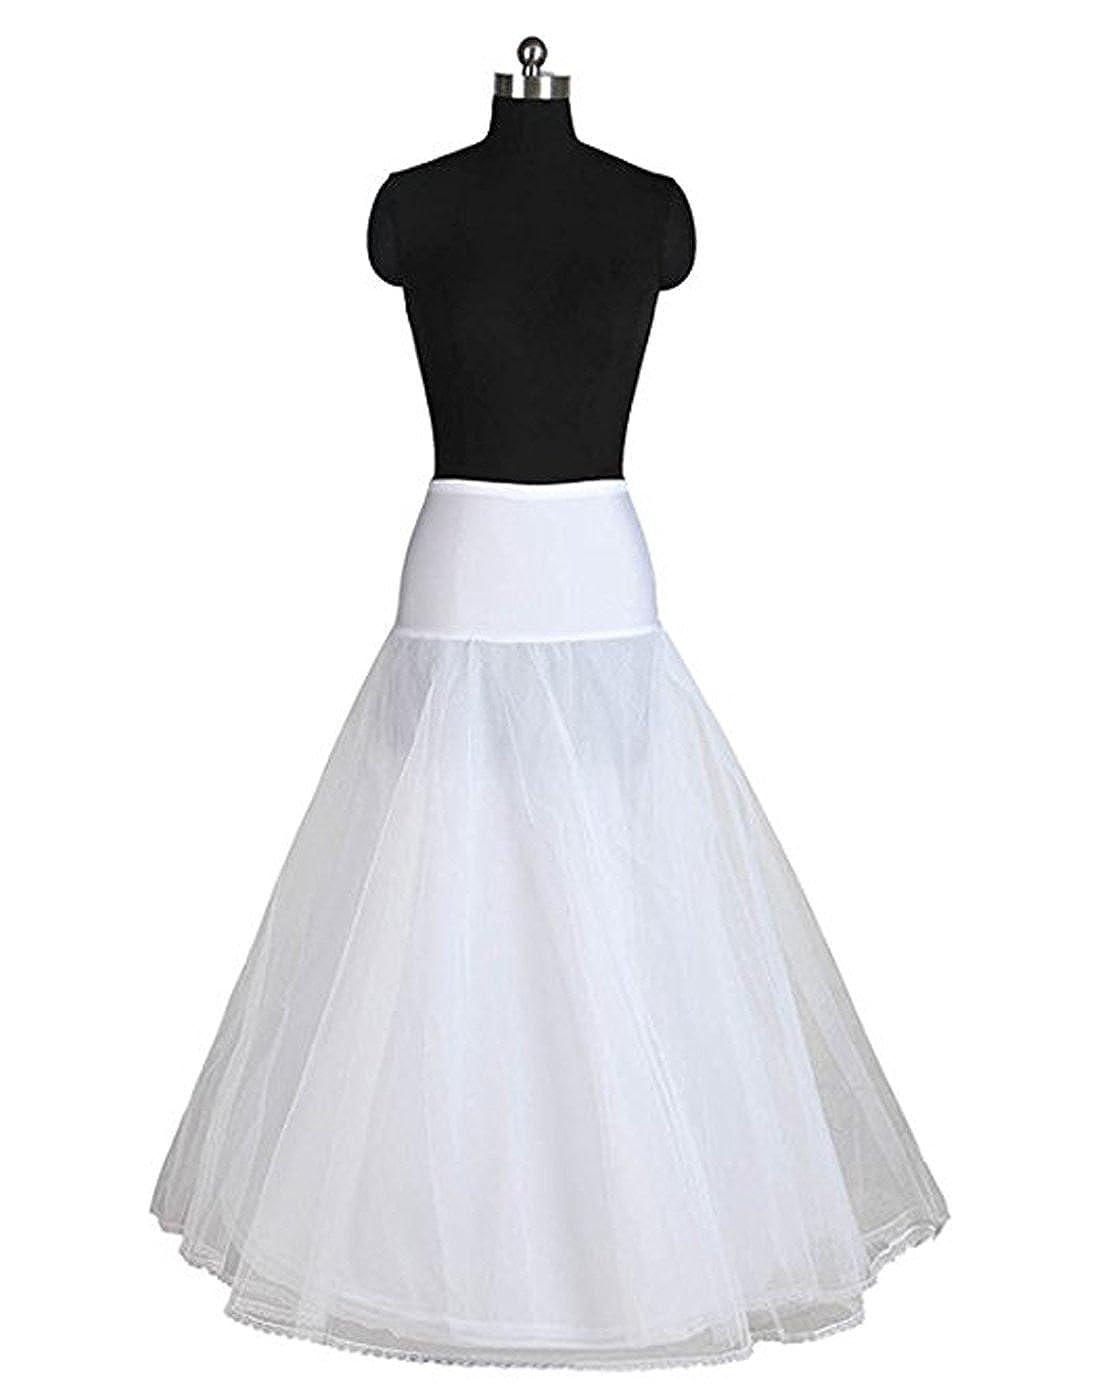 BEAUTELICATE A-line Full Gown Floor-Length Bridal Dress Gown Slip Petticoat Petticoat-03-US